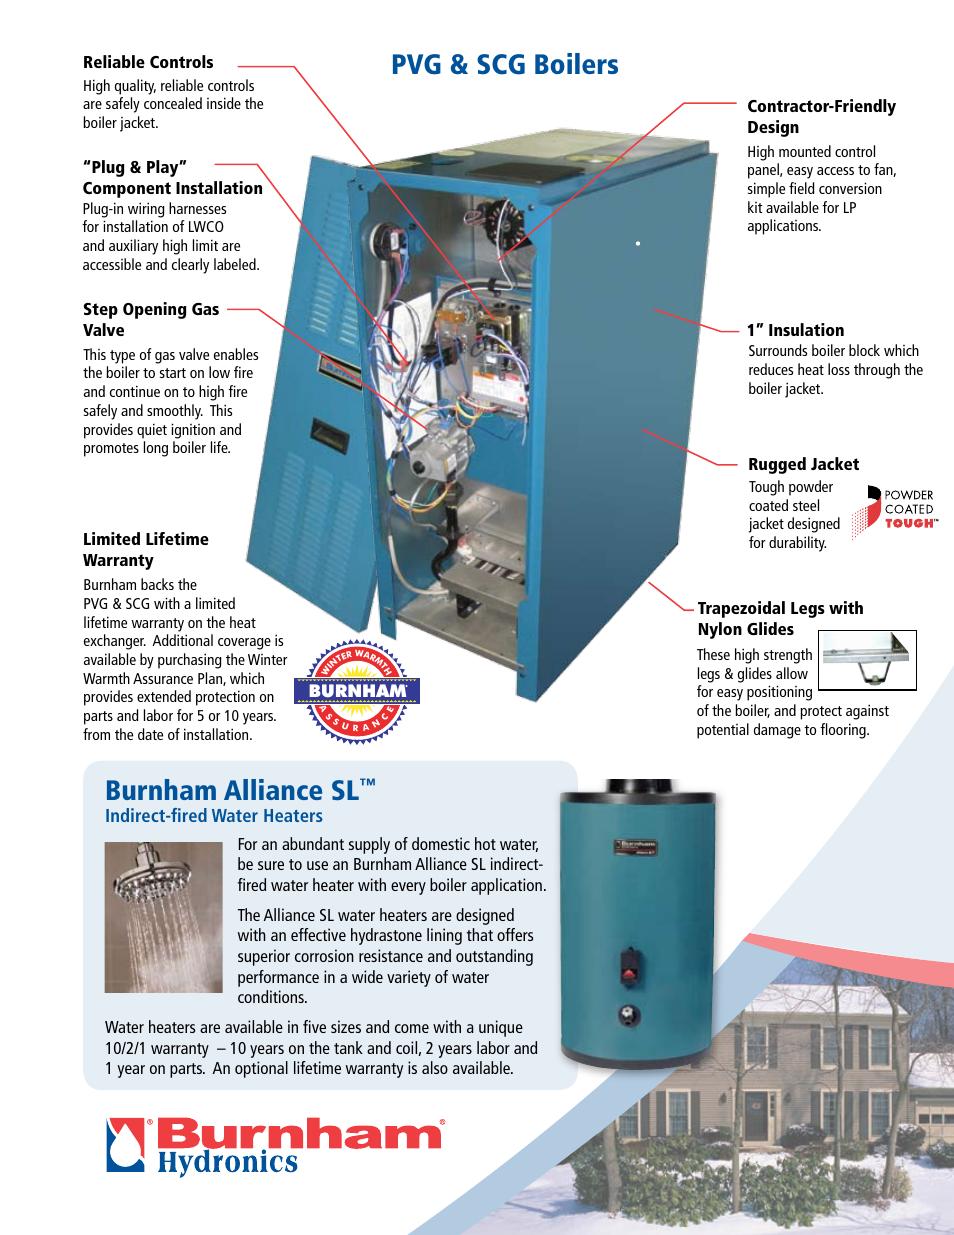 Pvg & scg boilers burnham alliance sl, Indirect-fired water heaters ...